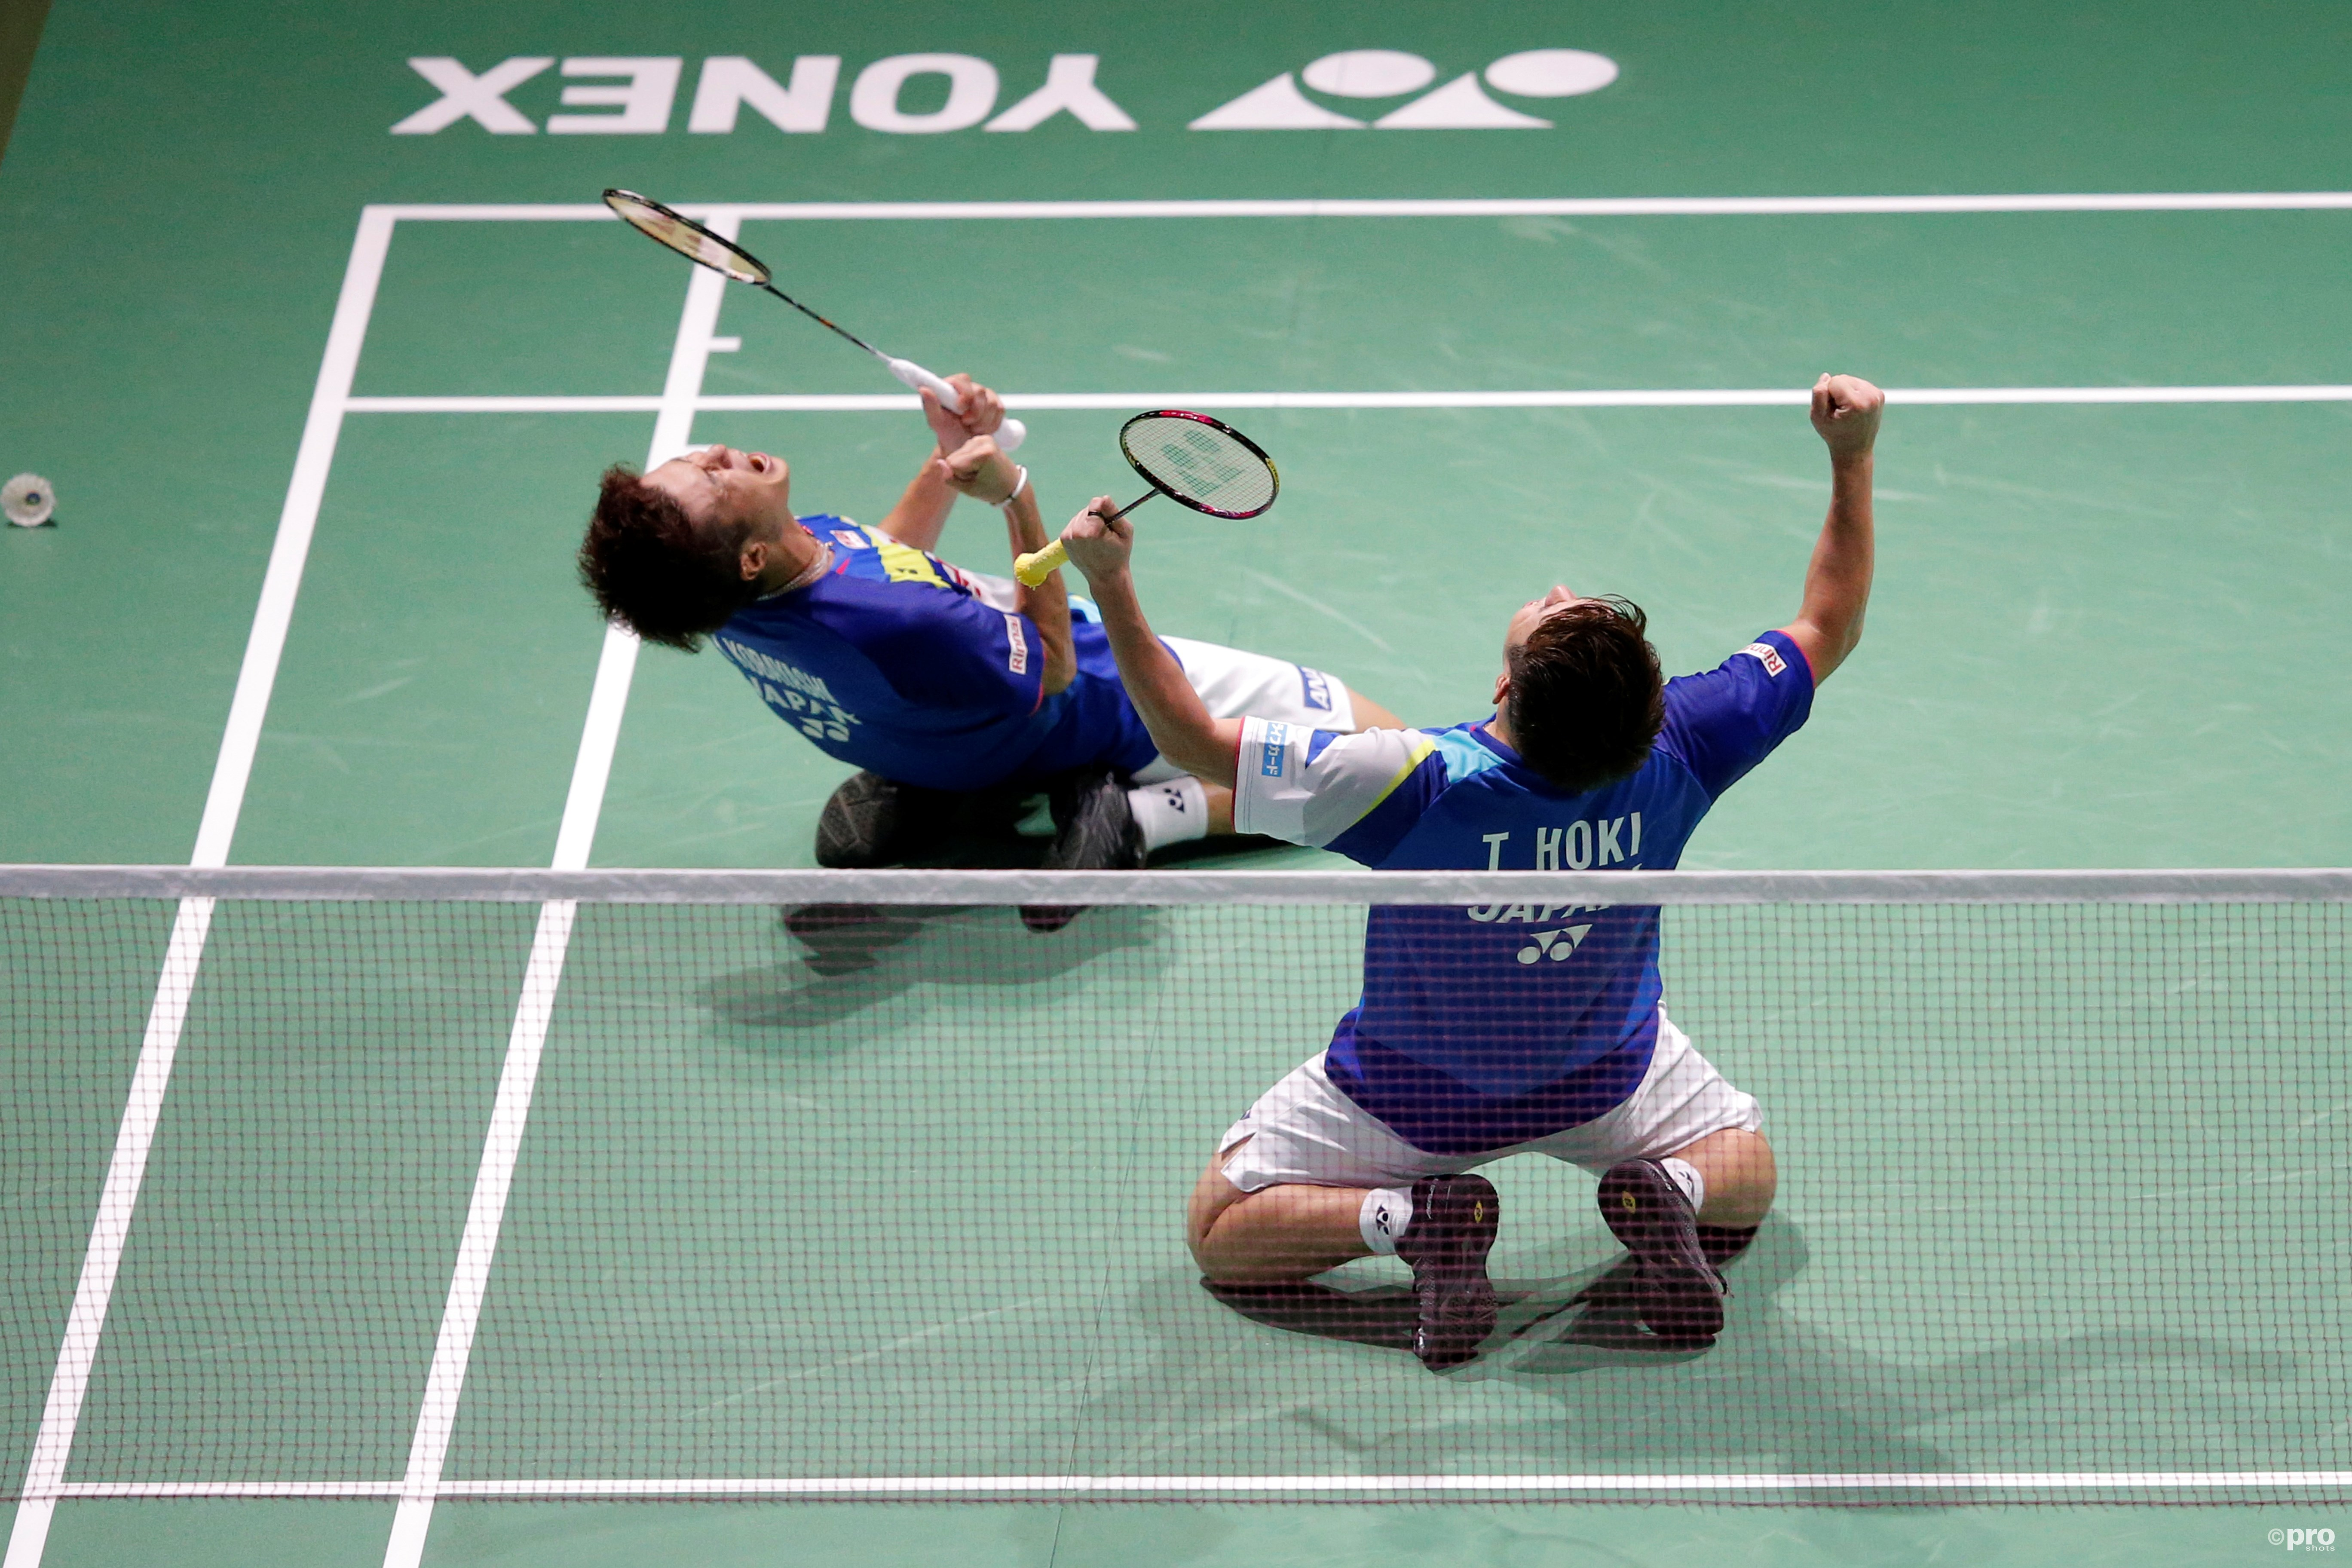 Hoki/Kobayashi verrassing van het toernooi (Pro Shots / Action Images)